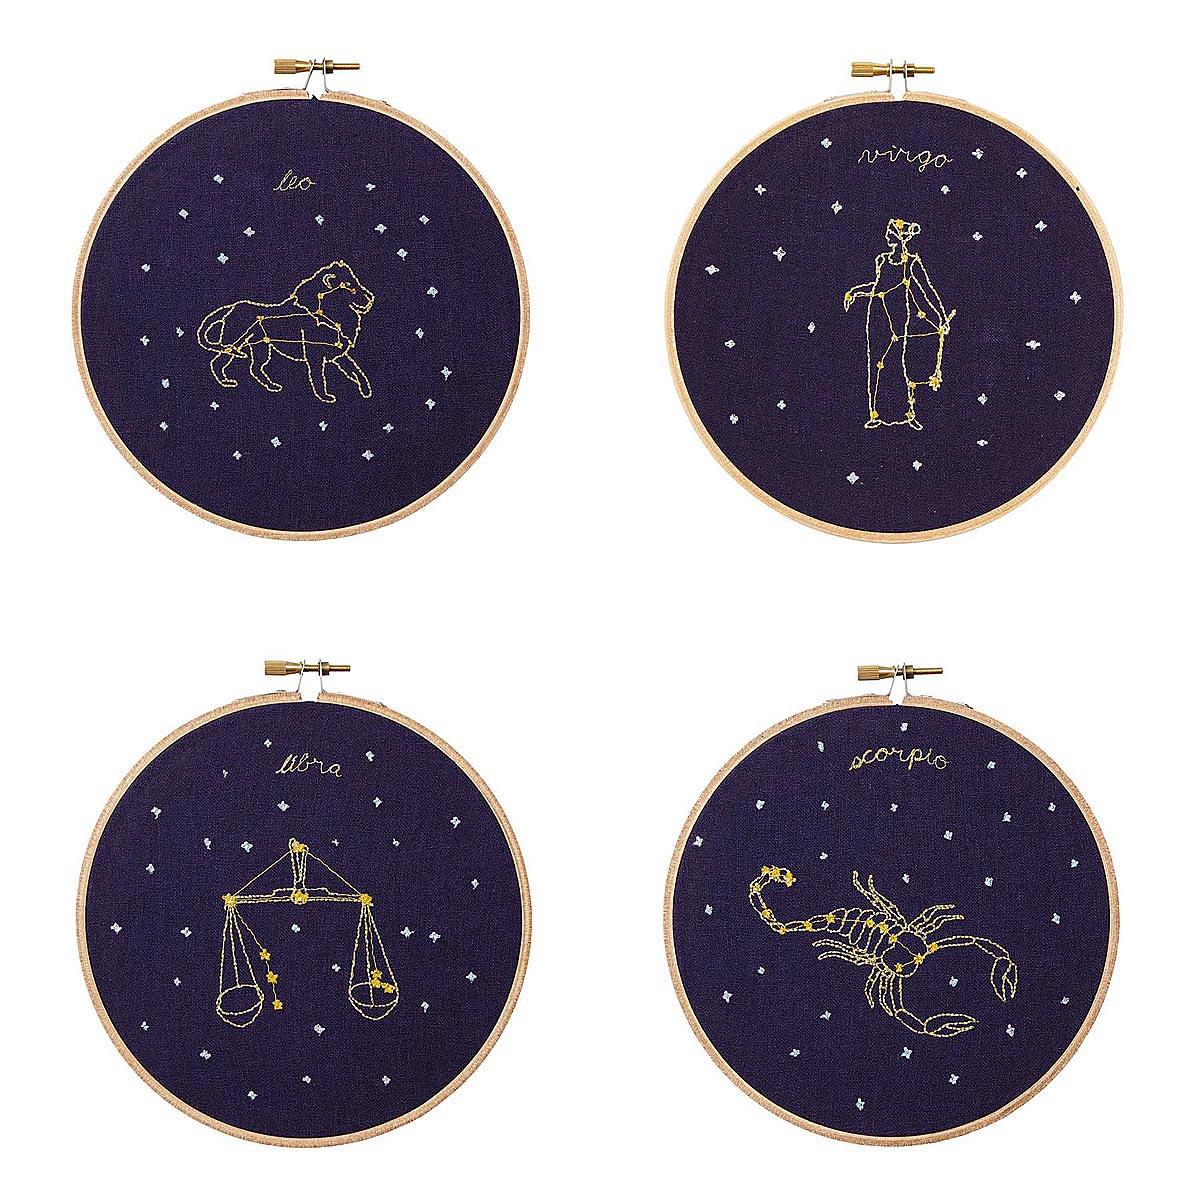 Zodiac Embroidery Hoop Art | needlepoint, astrology, embroidery hoop ...